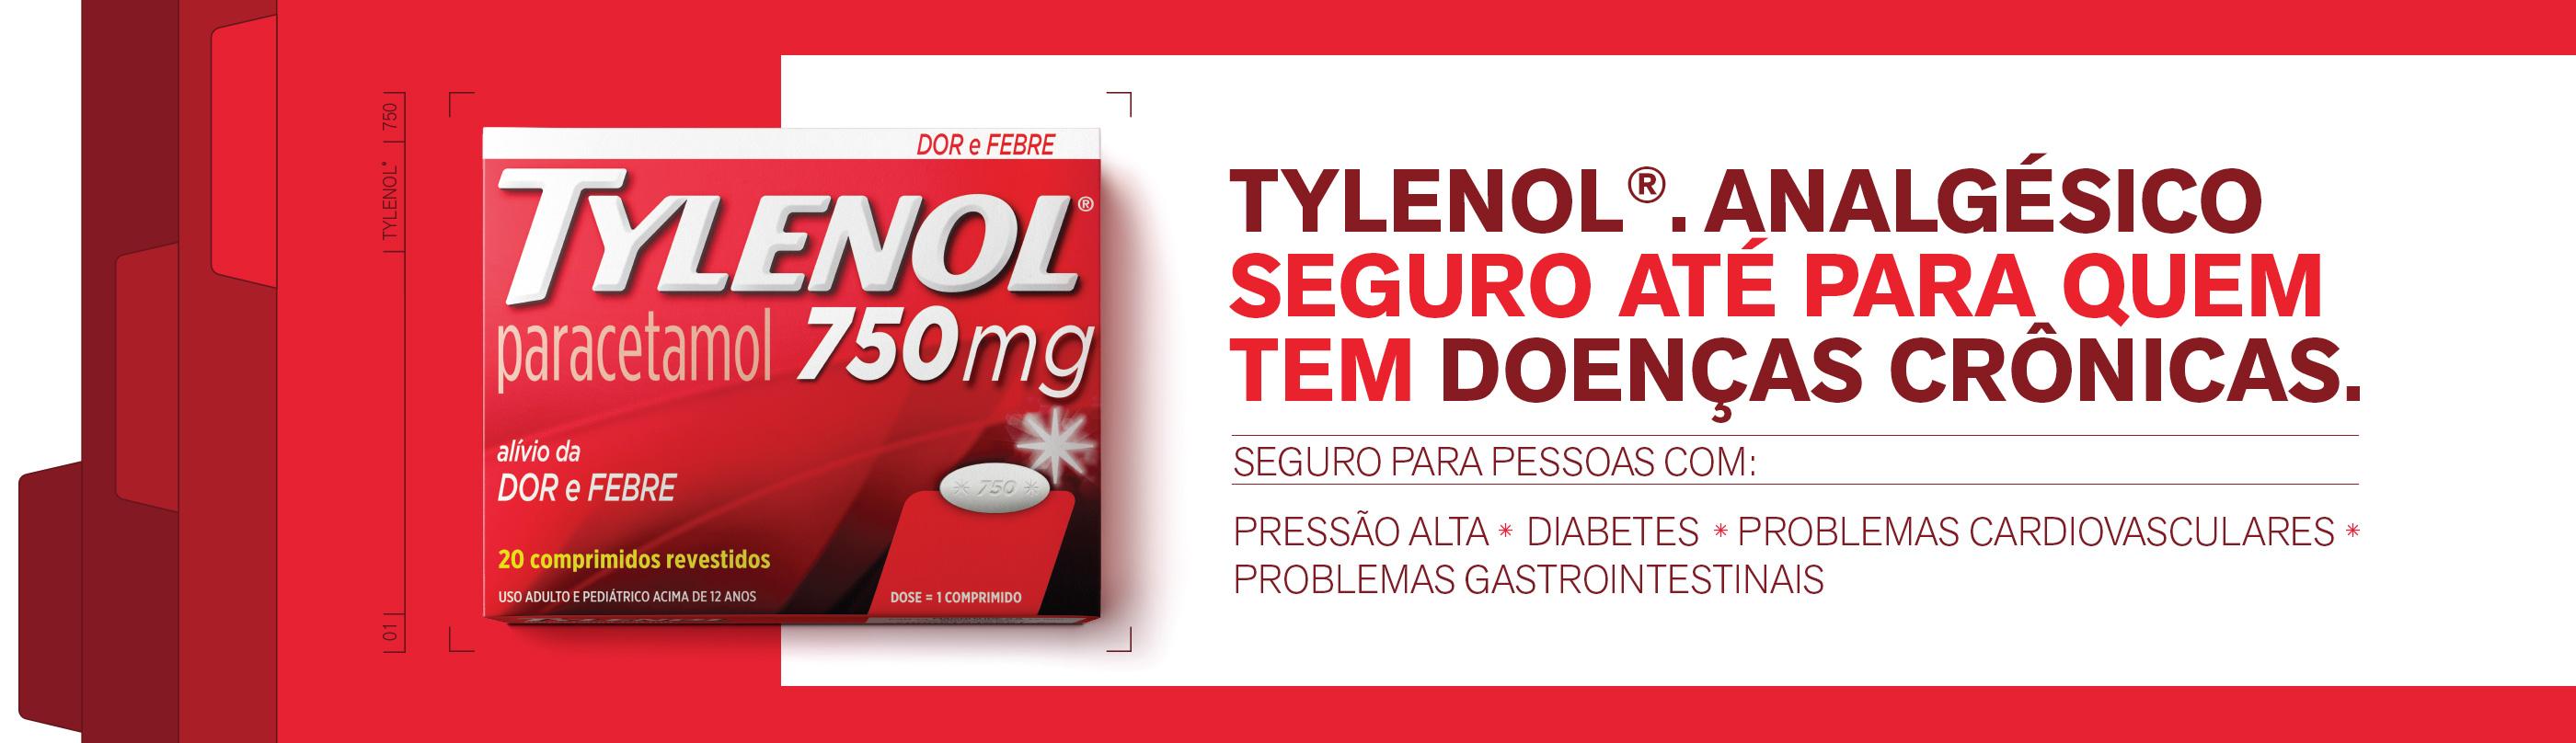 Banner Tylenol